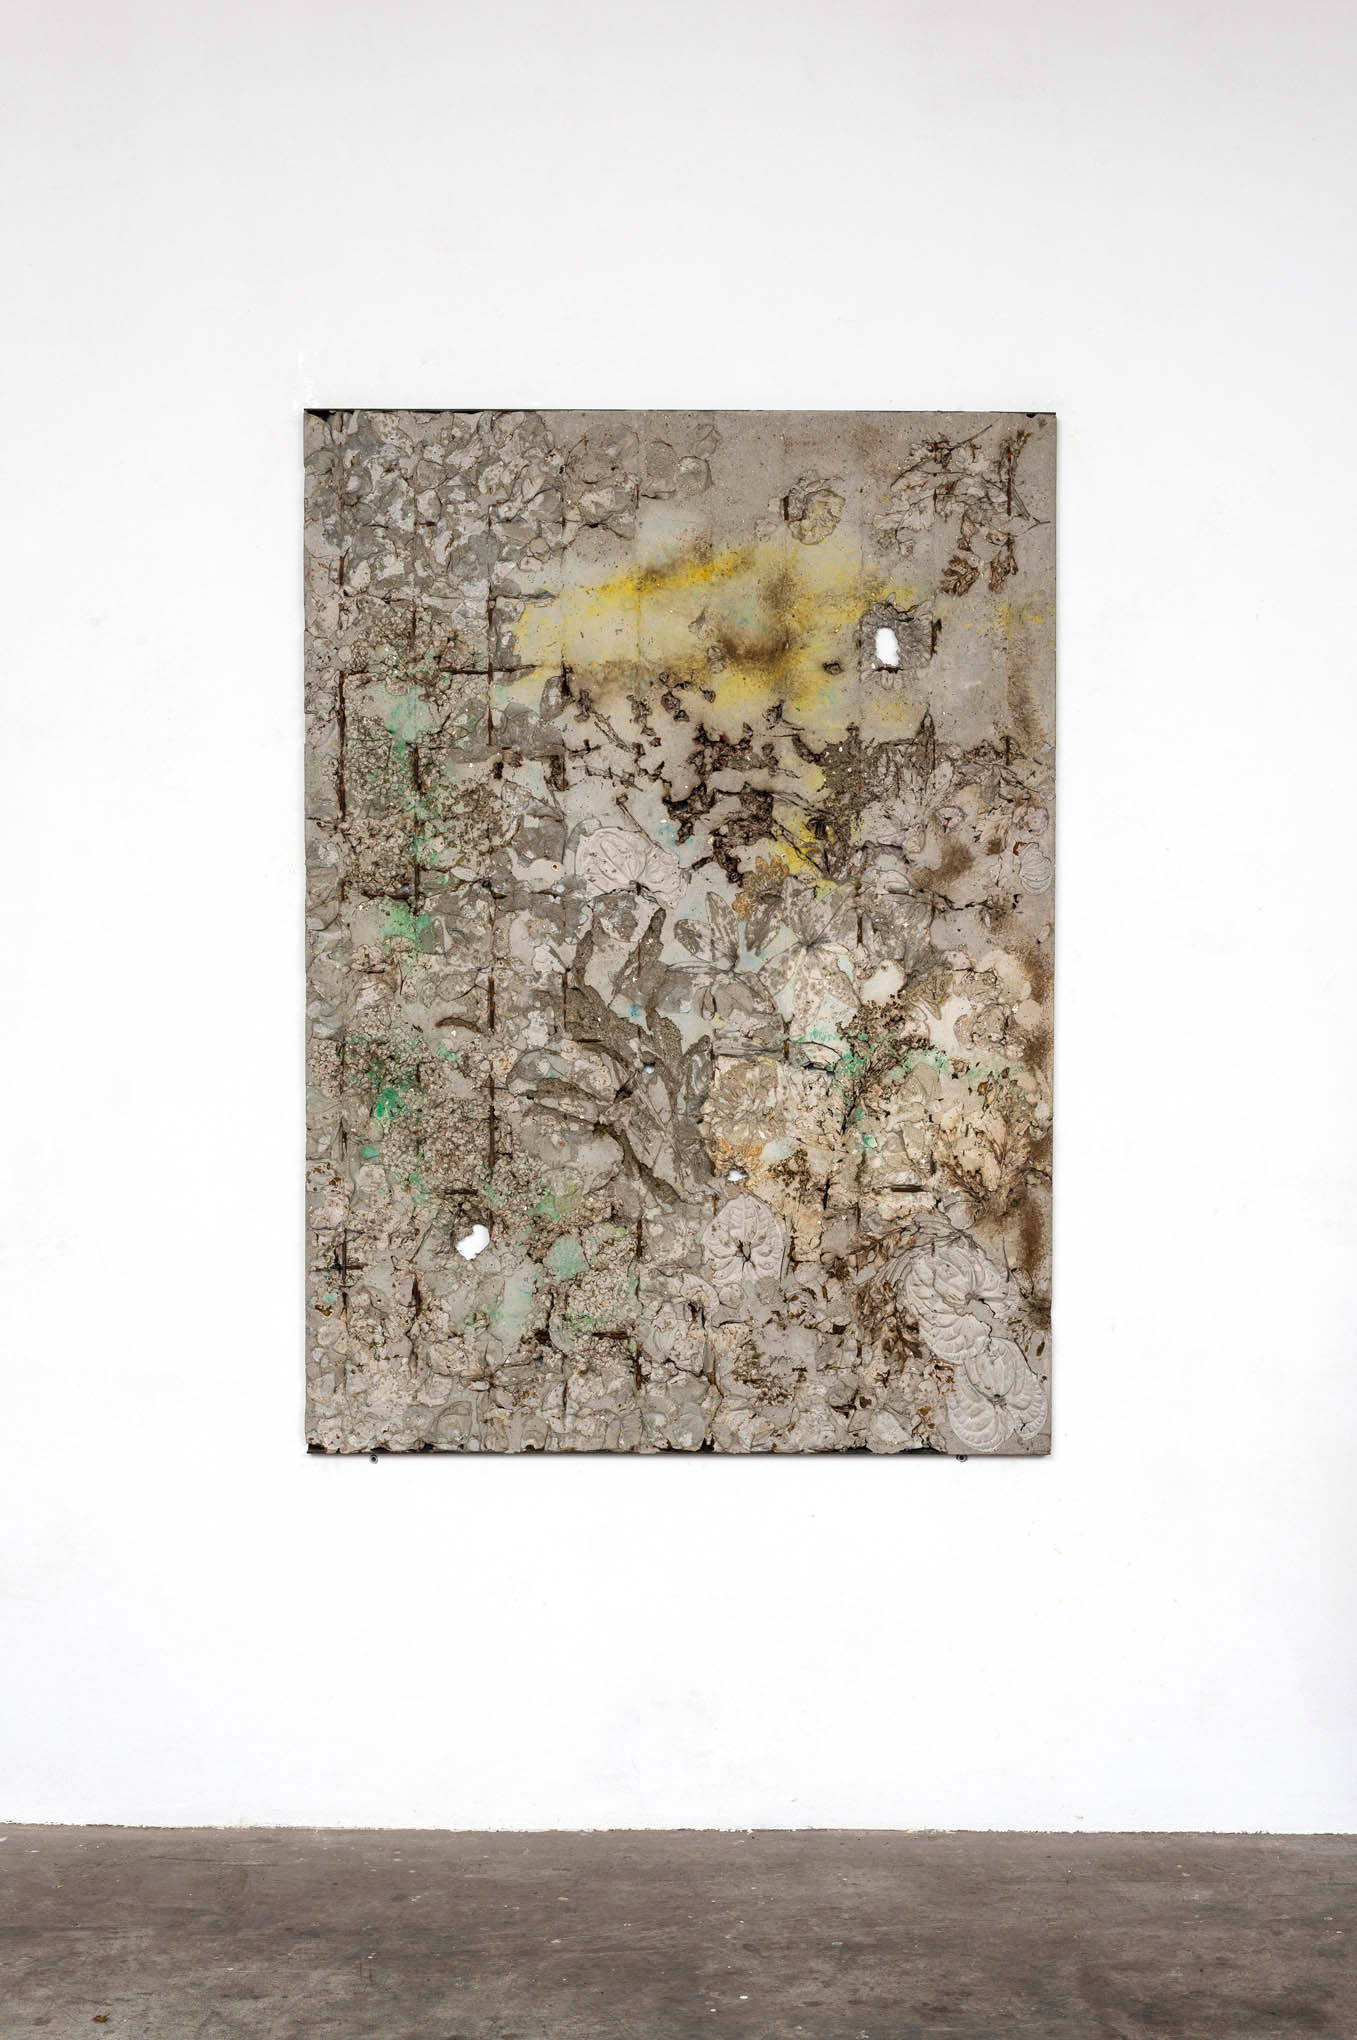 Ieri Ikebana 030820163, 2016  Concrete, flowers, metal  cm 141x101x2,5